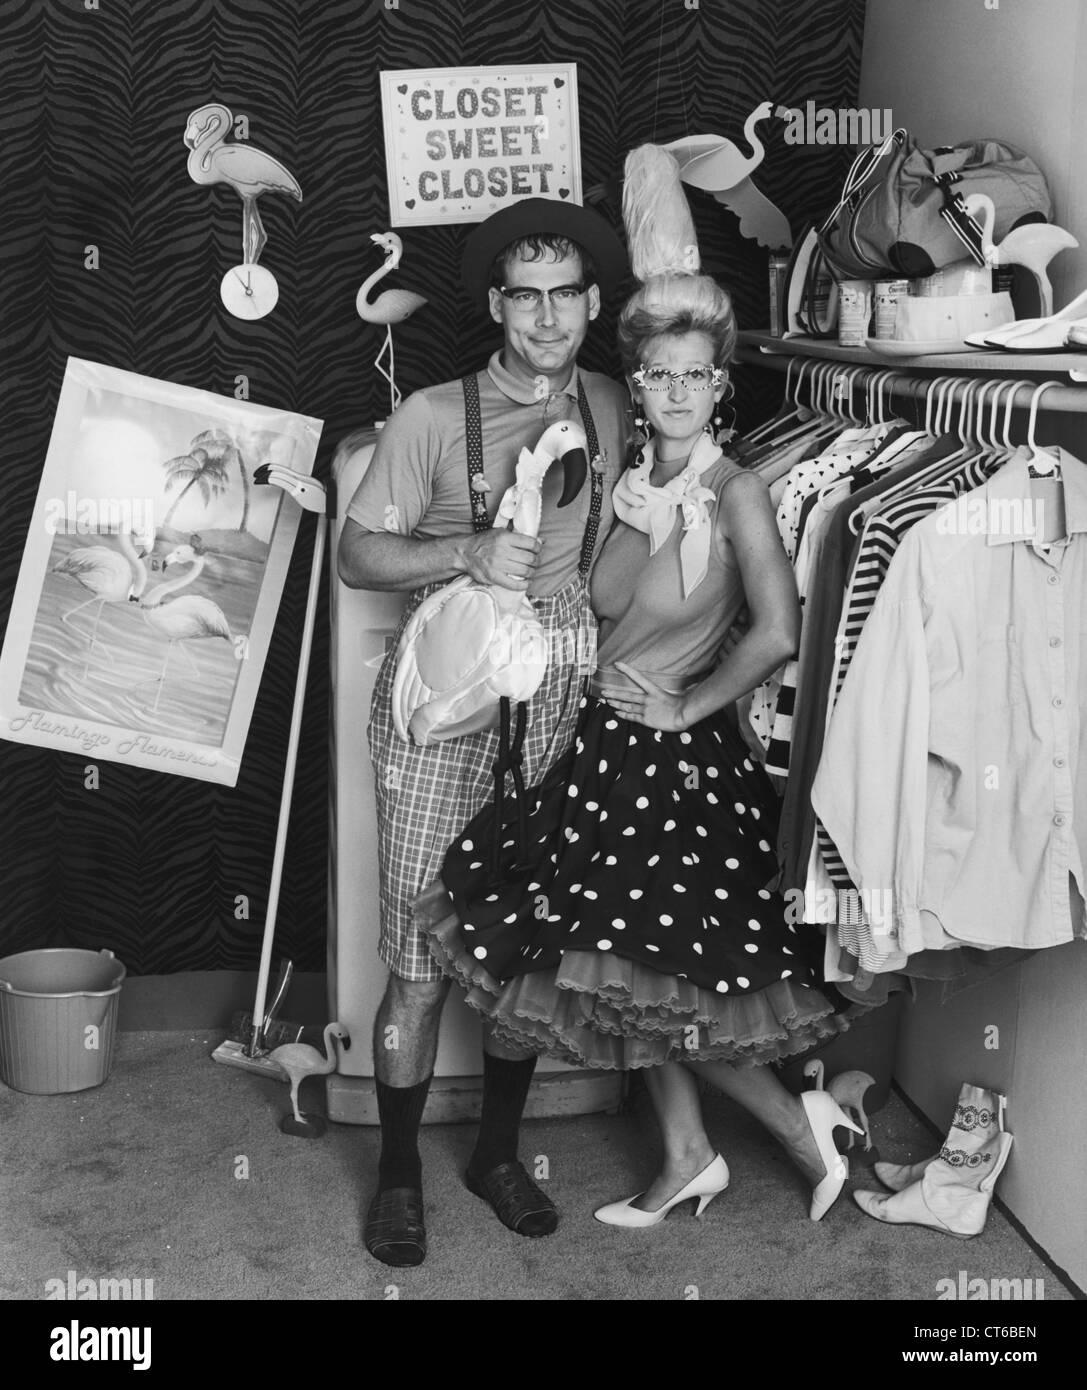 Vintage couple wearing sixties style clothing - Stock Image